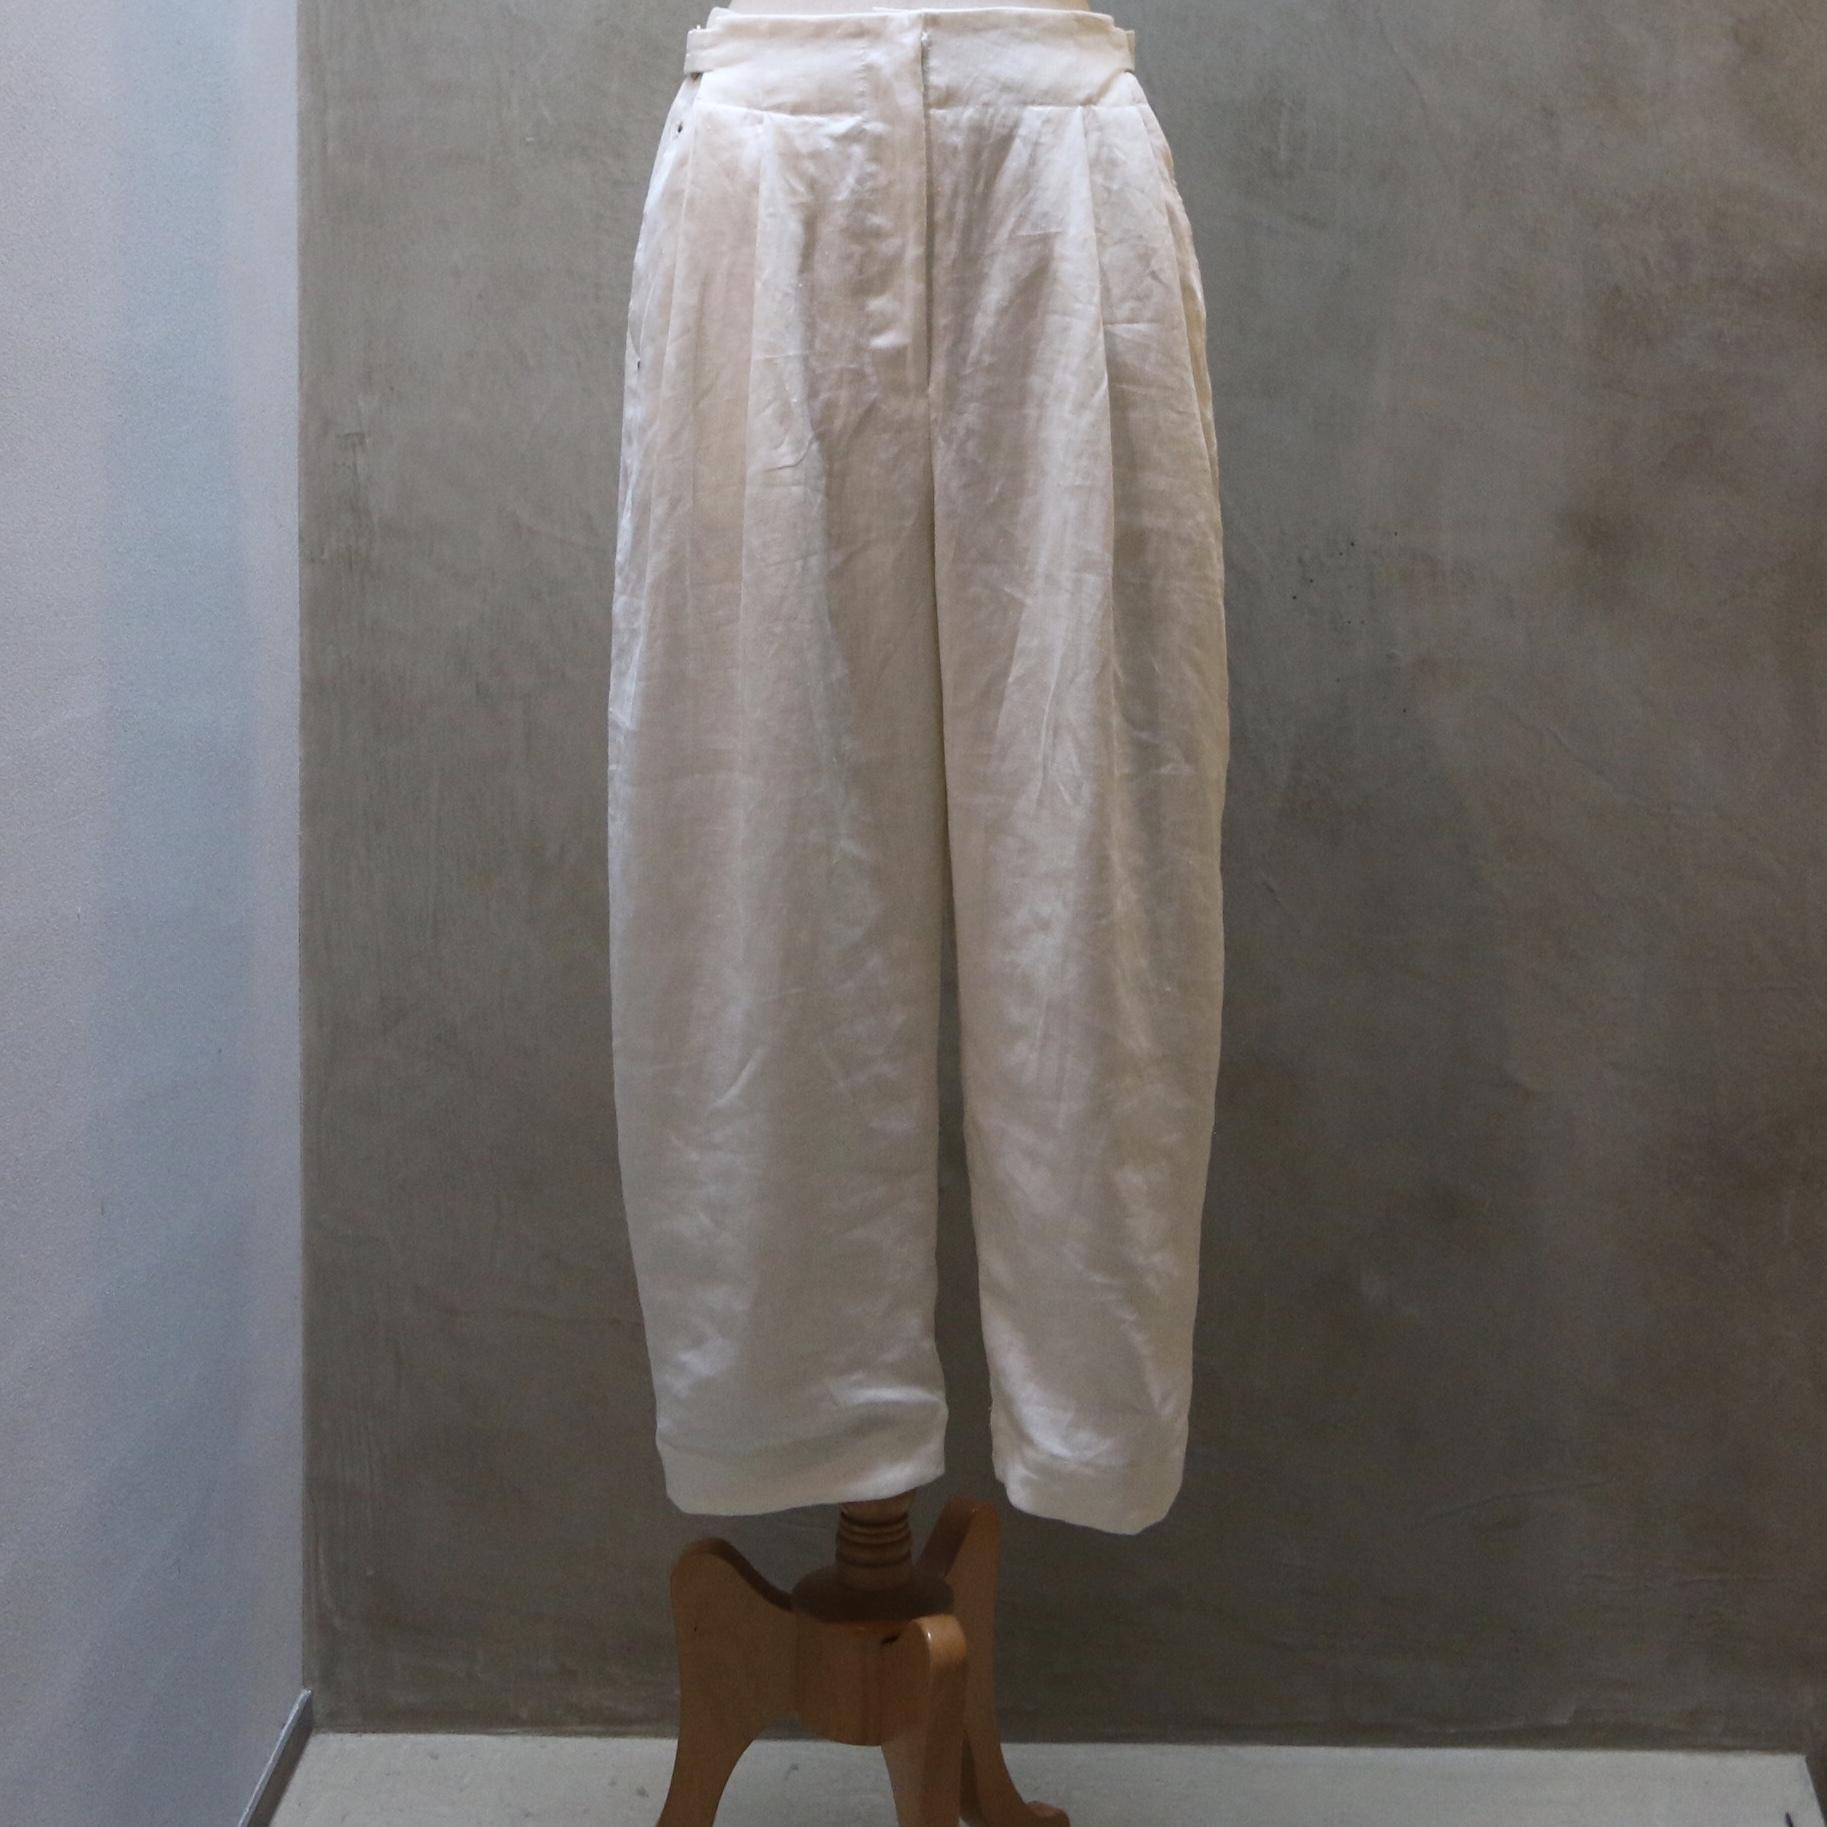 Suie(スィ)Volendam Tuck Pants フレンチリネン off white 【ご予約商品】